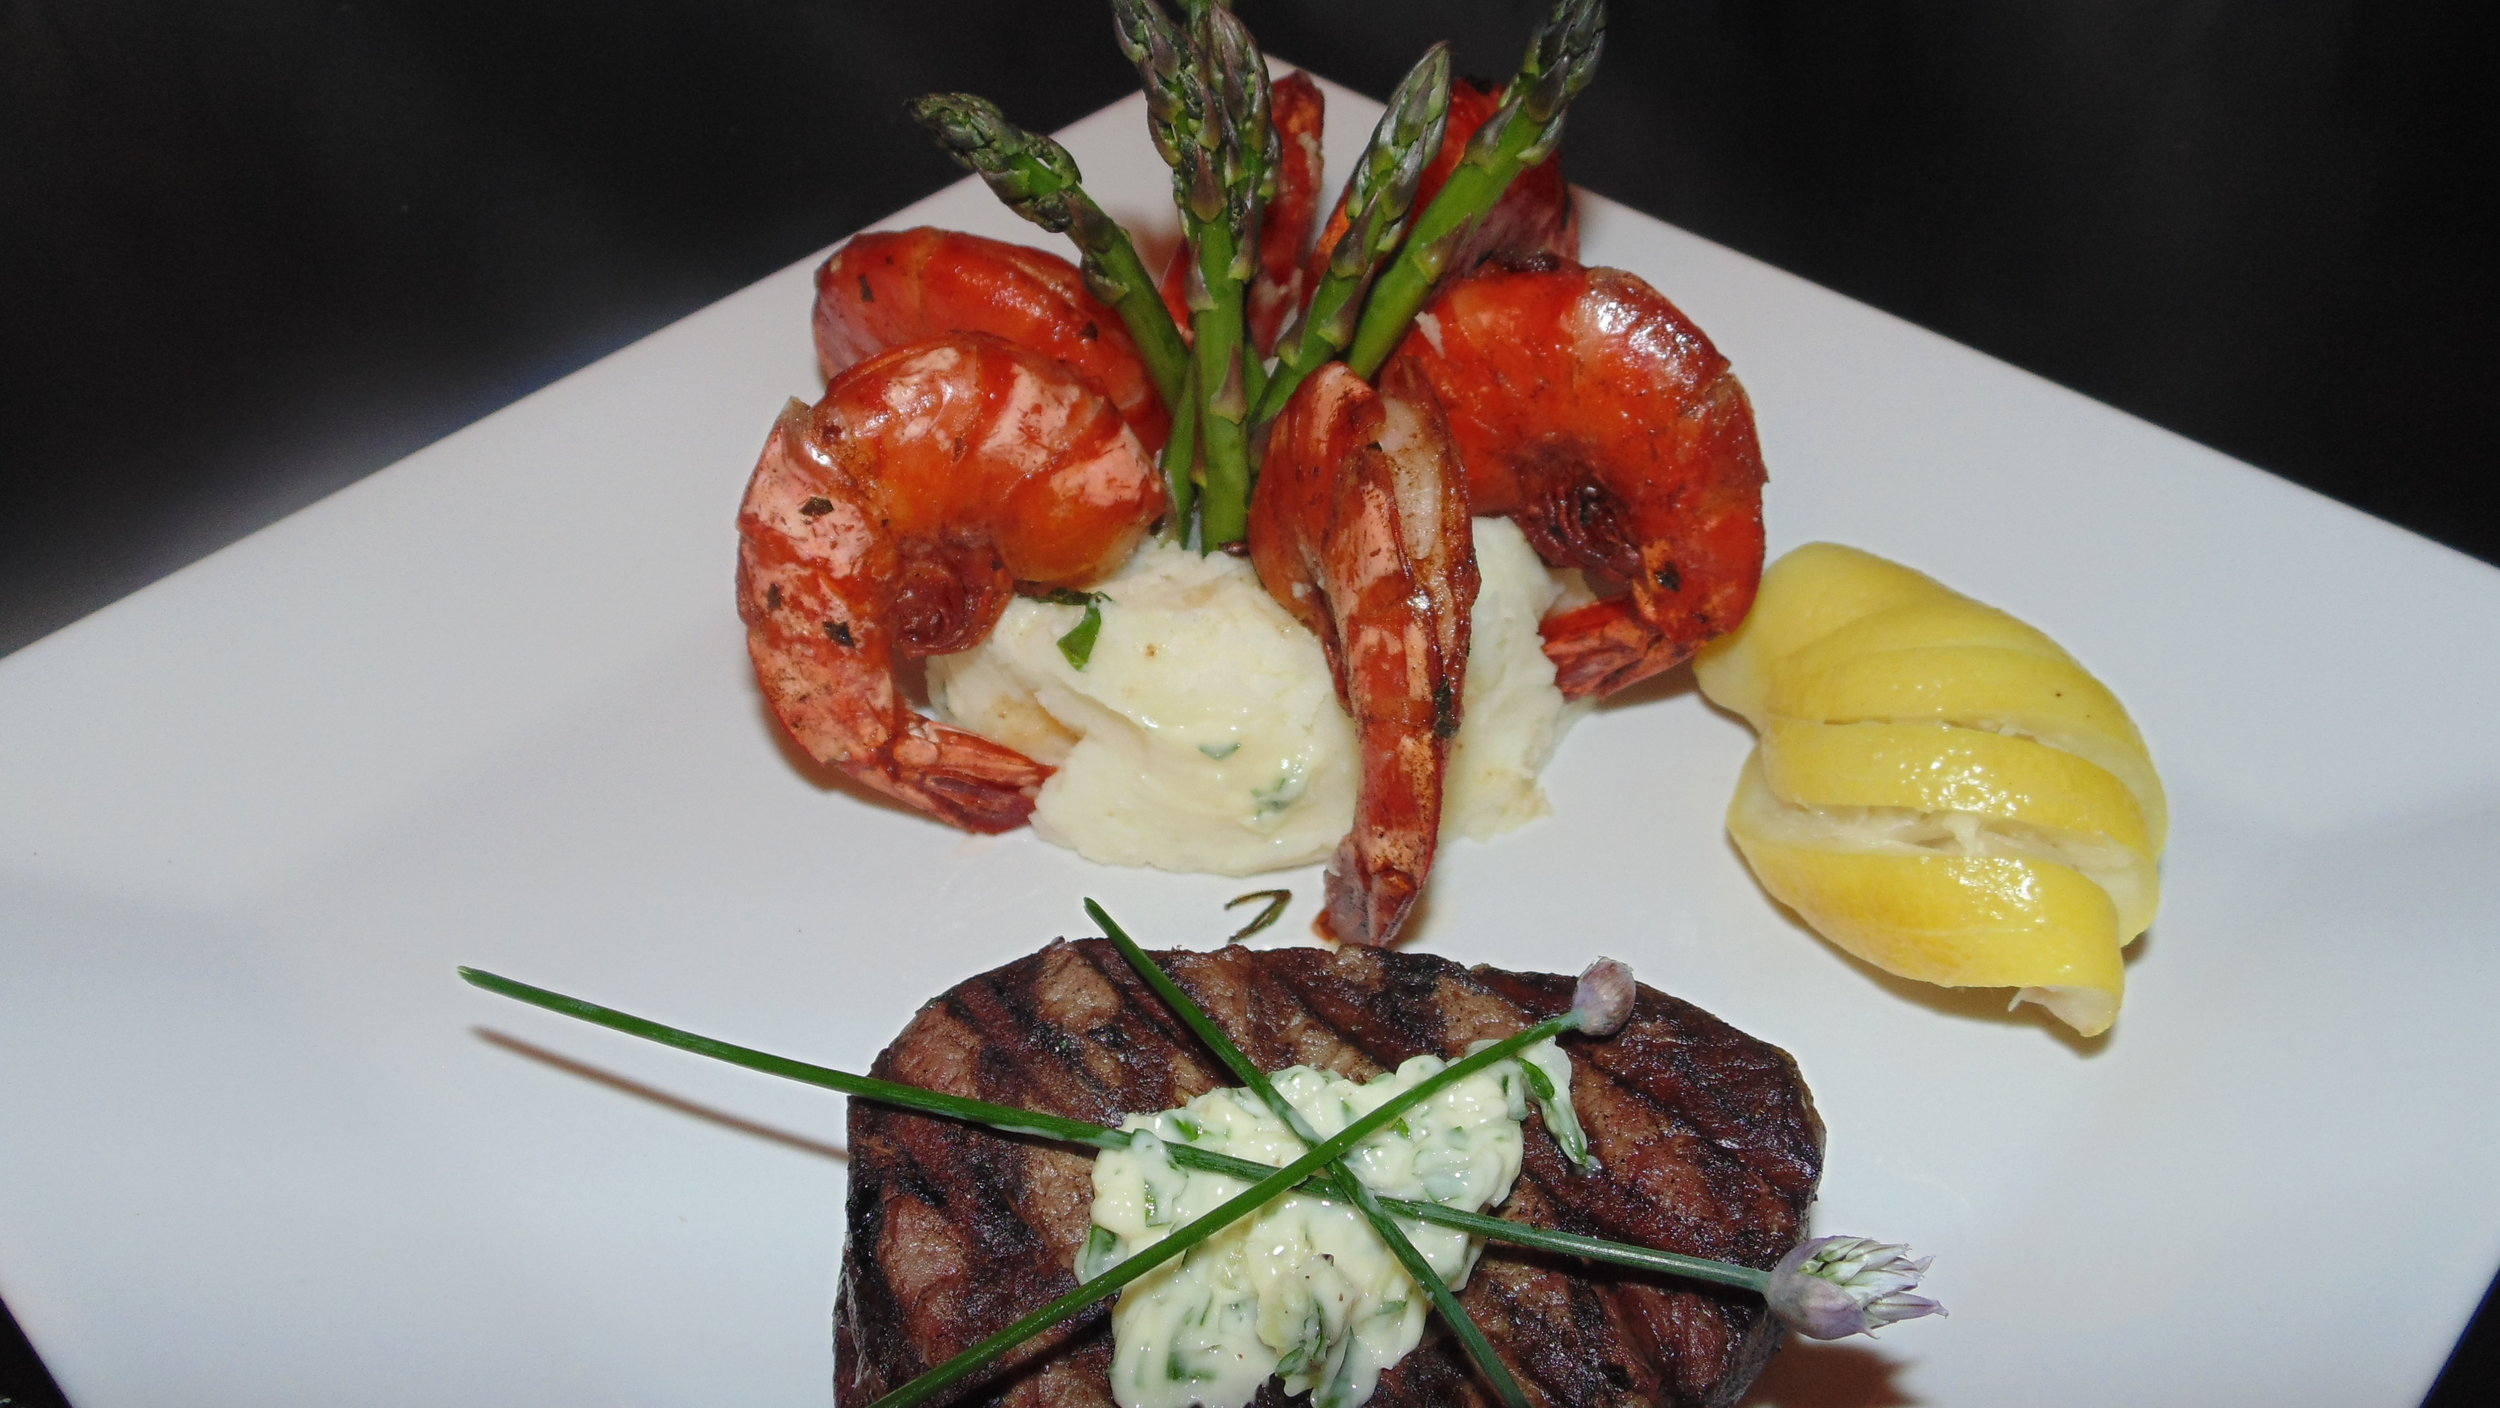 Surf & Turf - Tenderloin Steak and Shrimp in a Creamy Lemon-Garlic Sauce